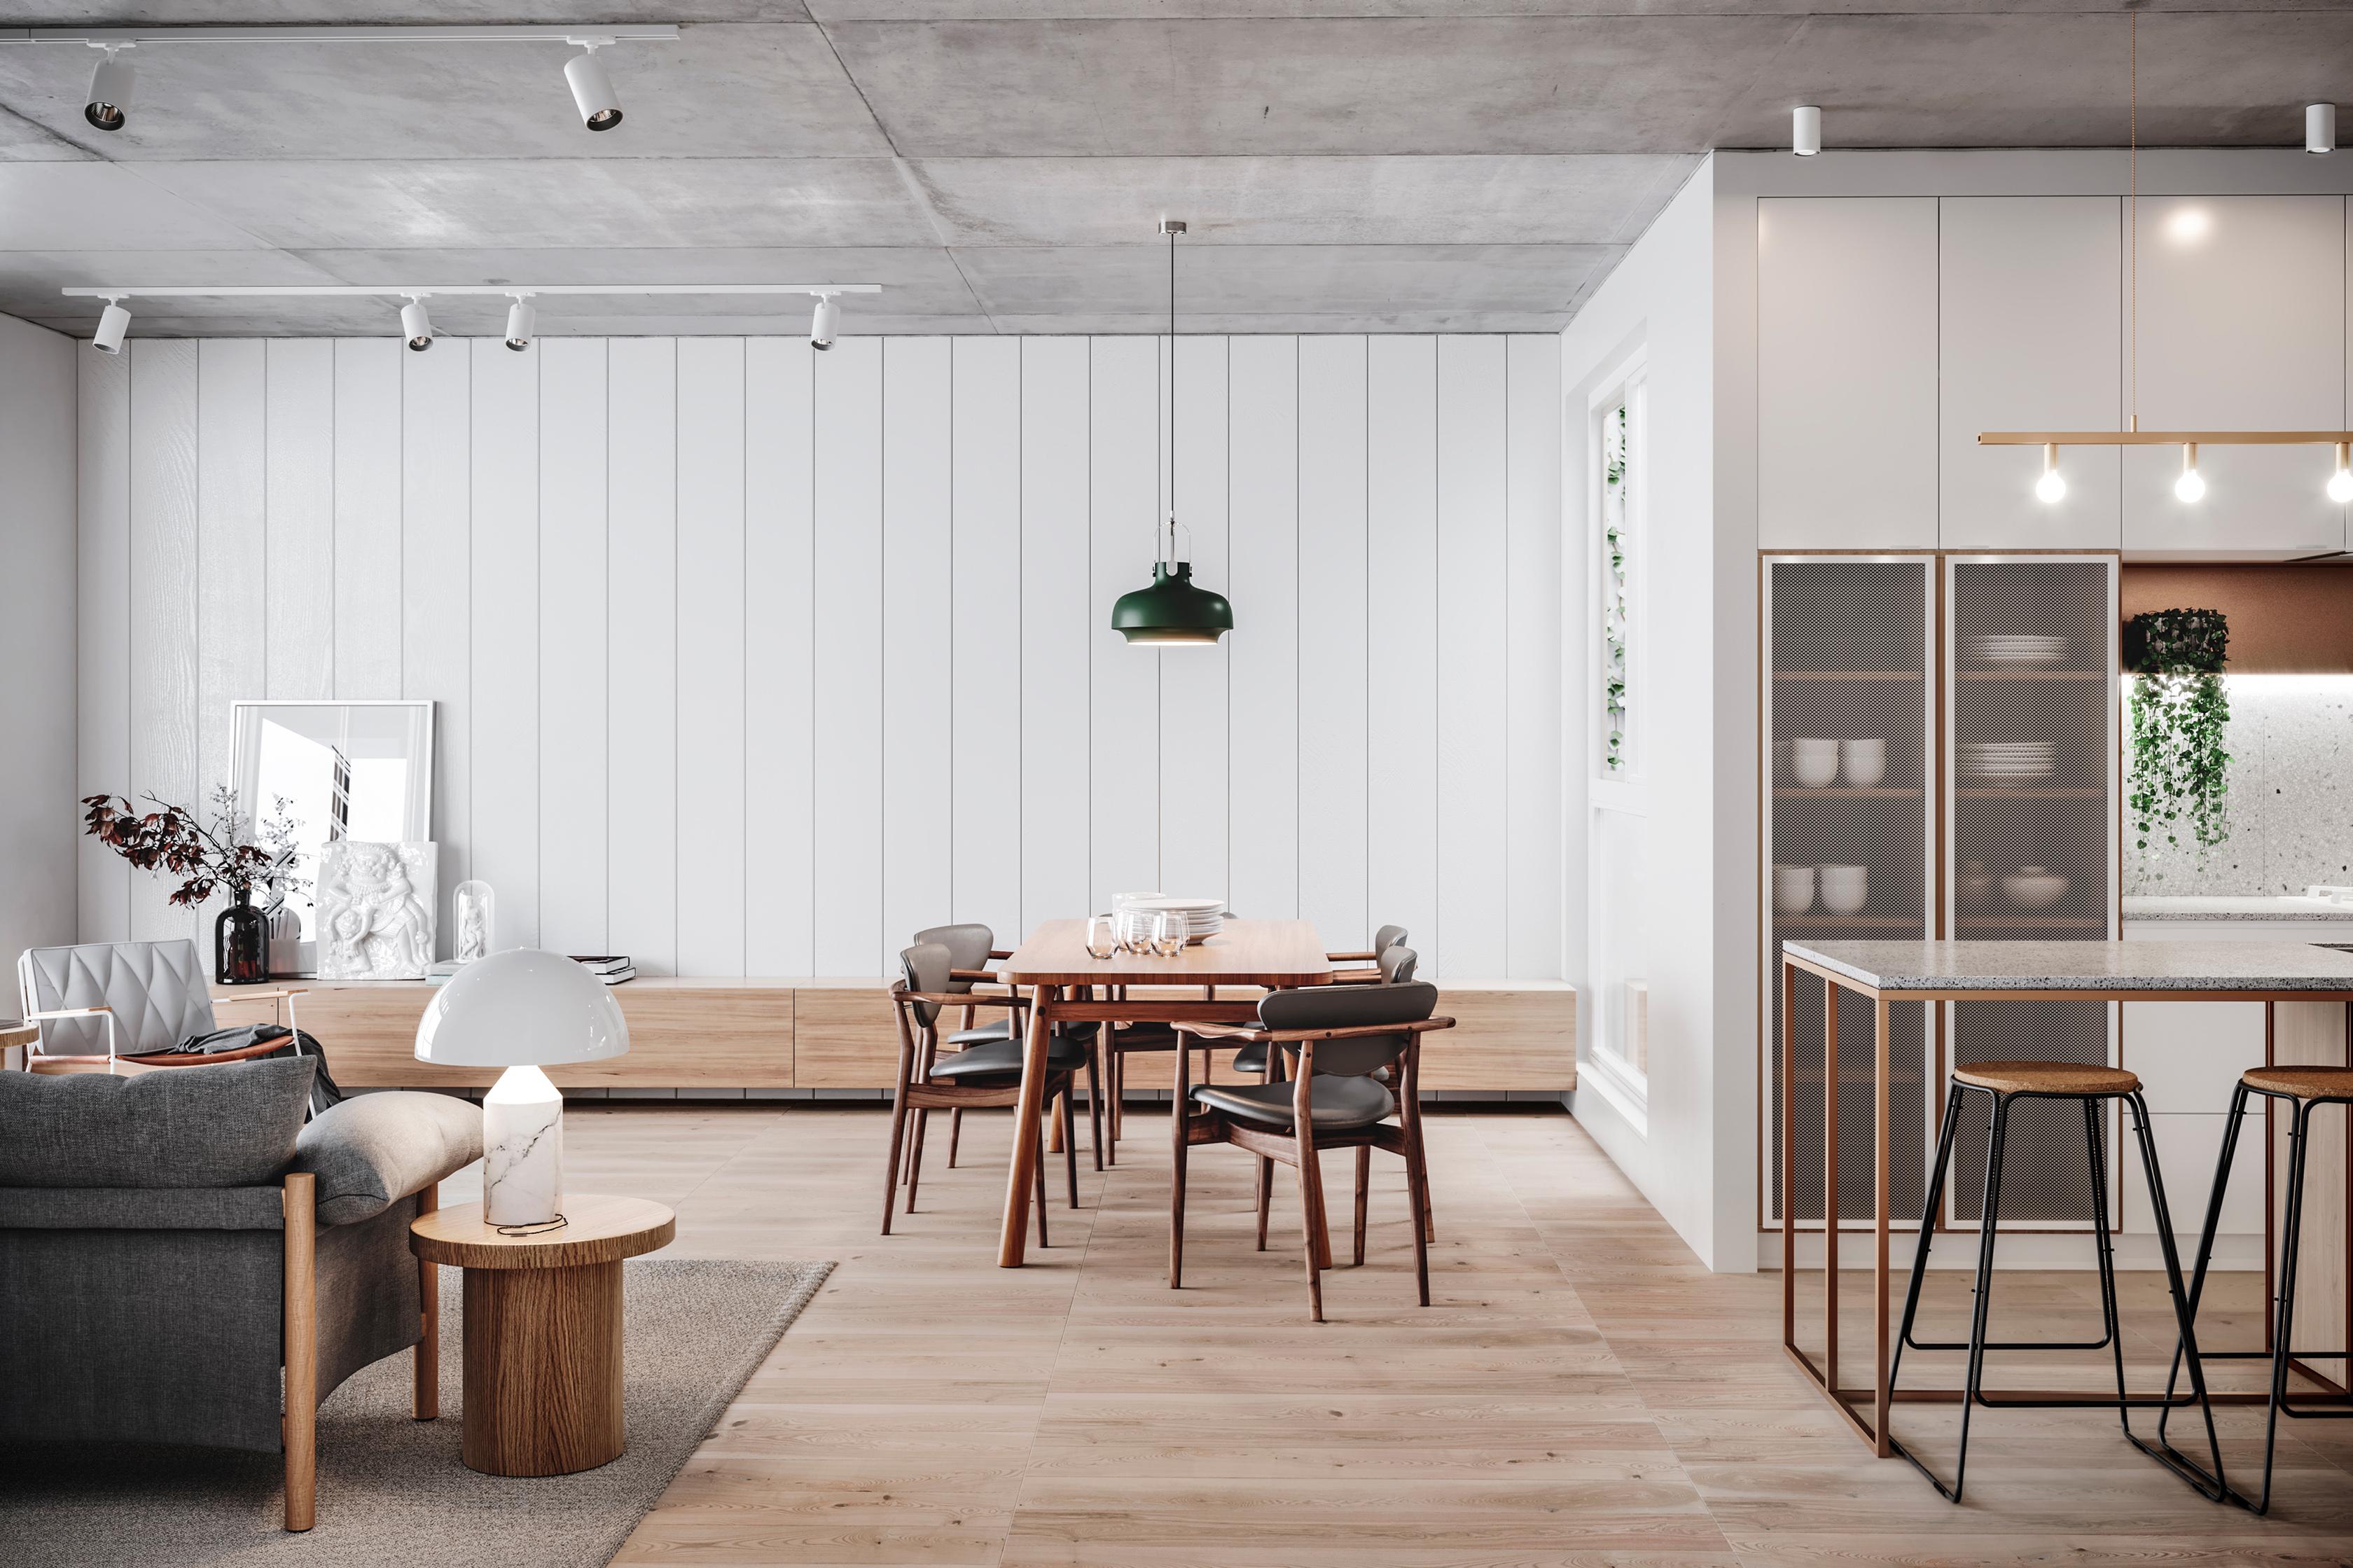 HO-ST apartments